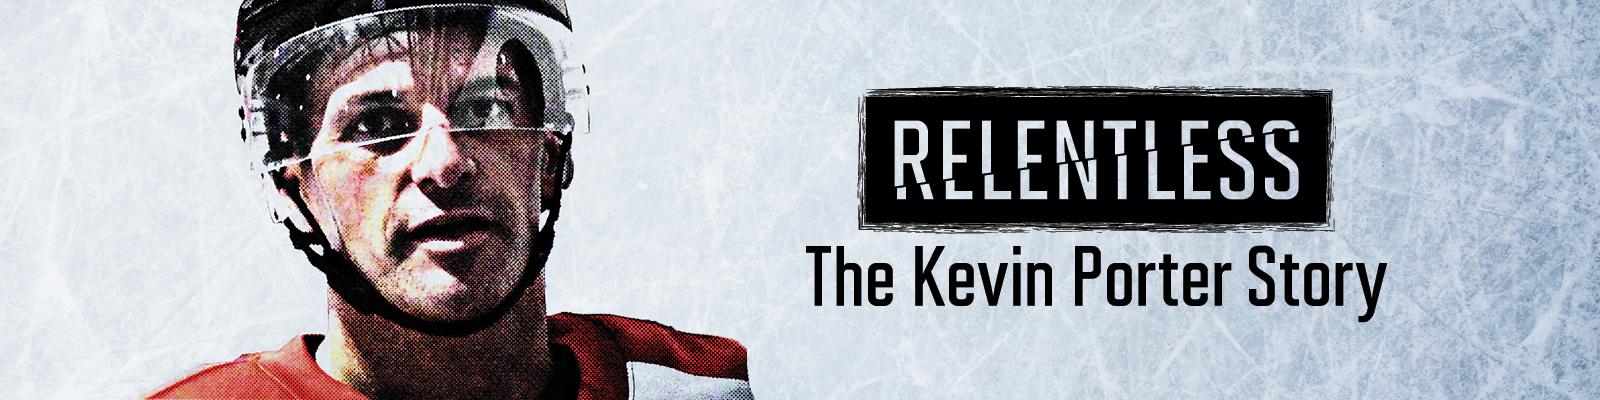 Relentless the Kevin Porter Story